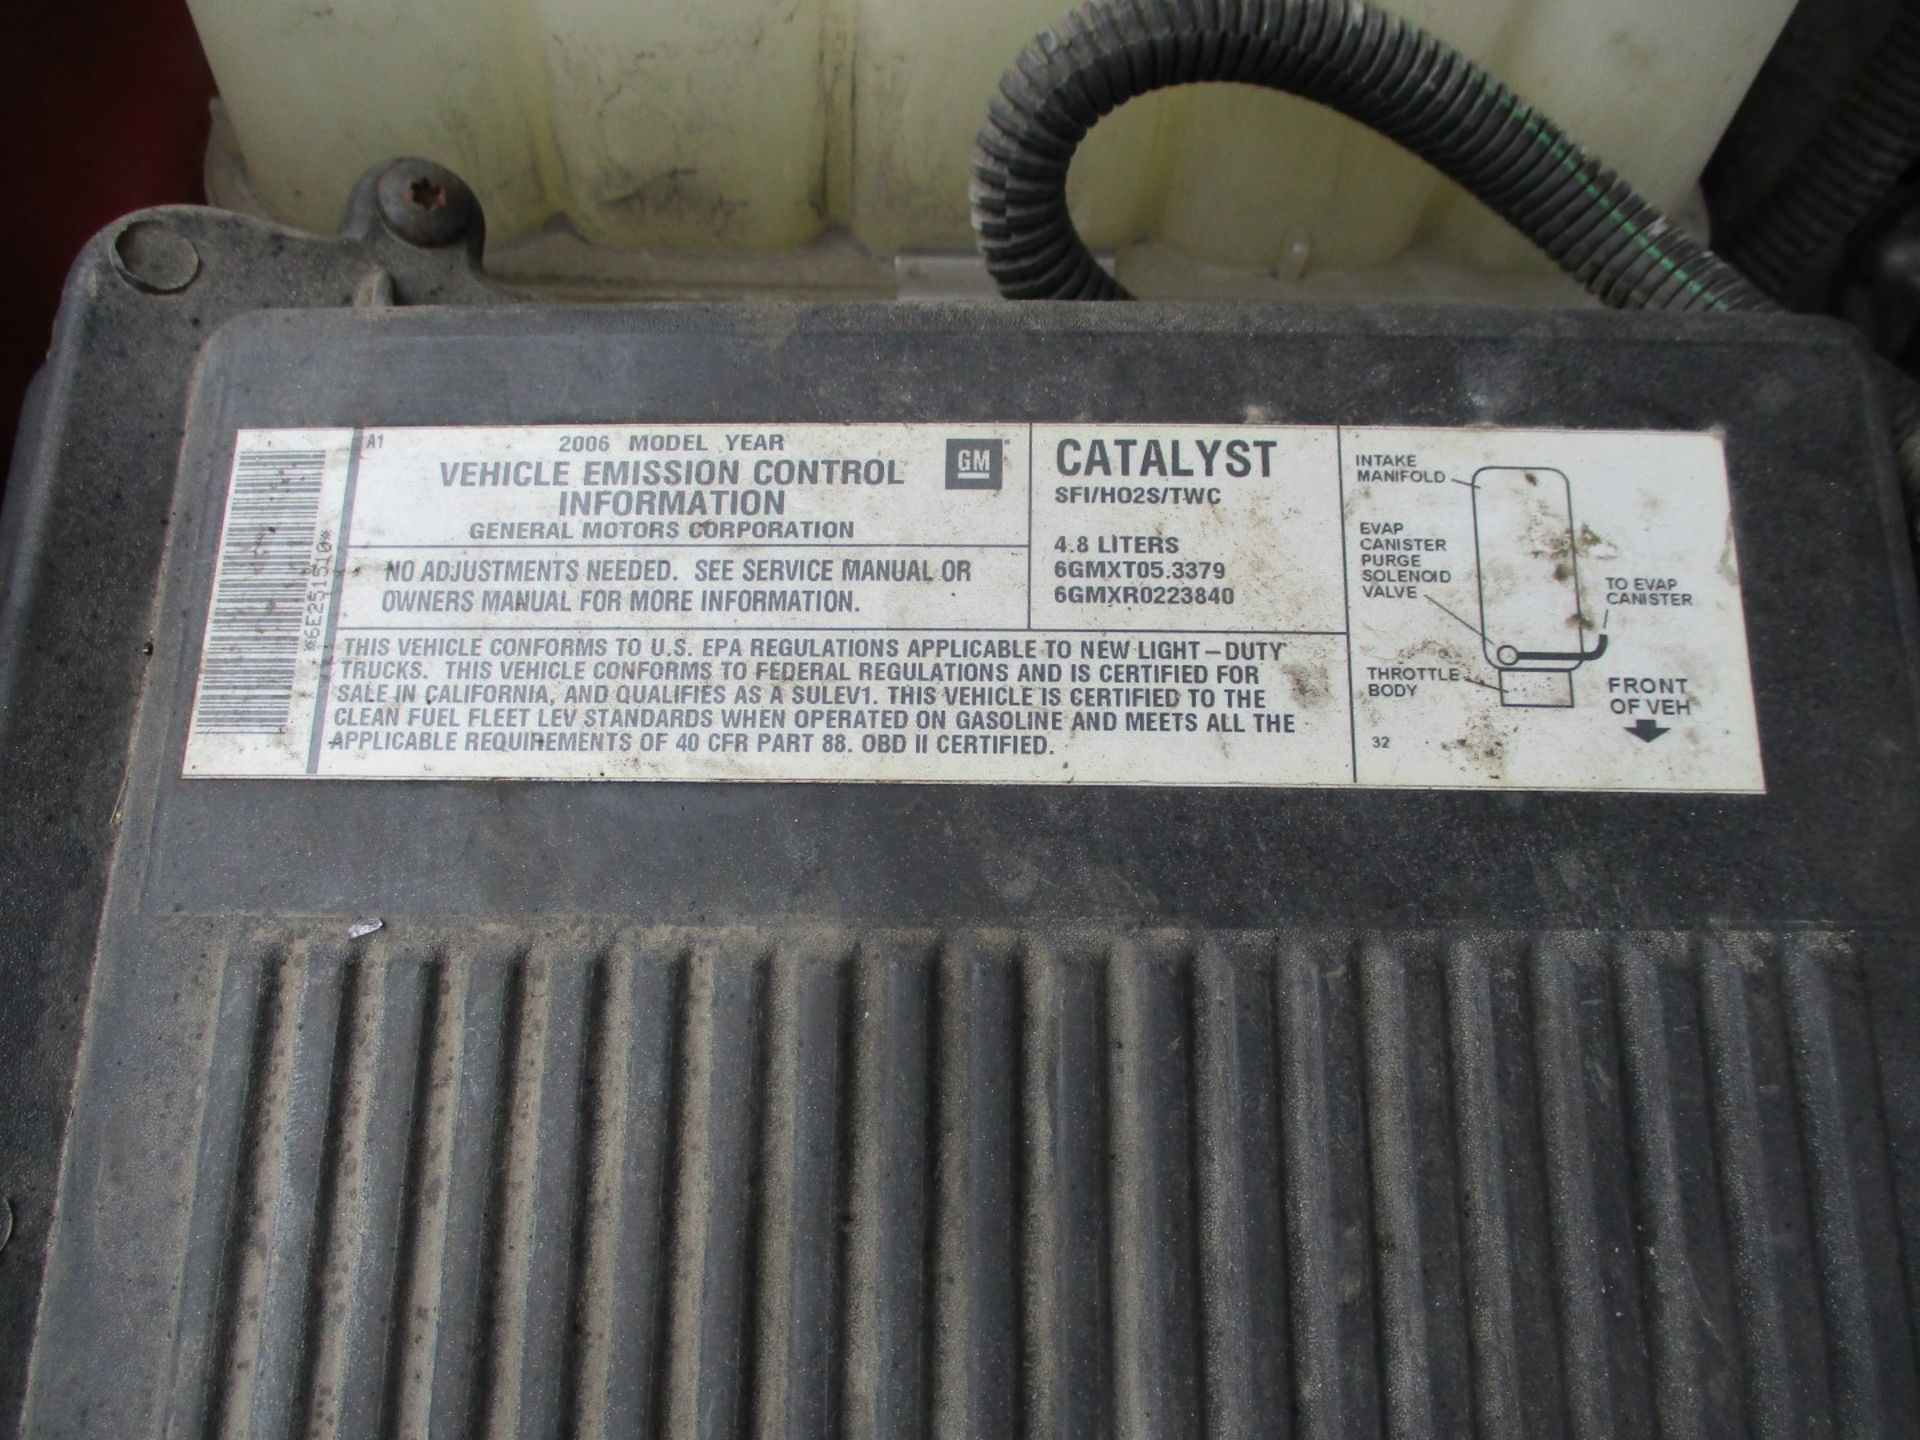 2006 Chevrolet Silverado 1500 LT Pickup, VIN 1GCEC14V96E251510, Regular Cab, Automatic, AC, 8' - Image 20 of 21